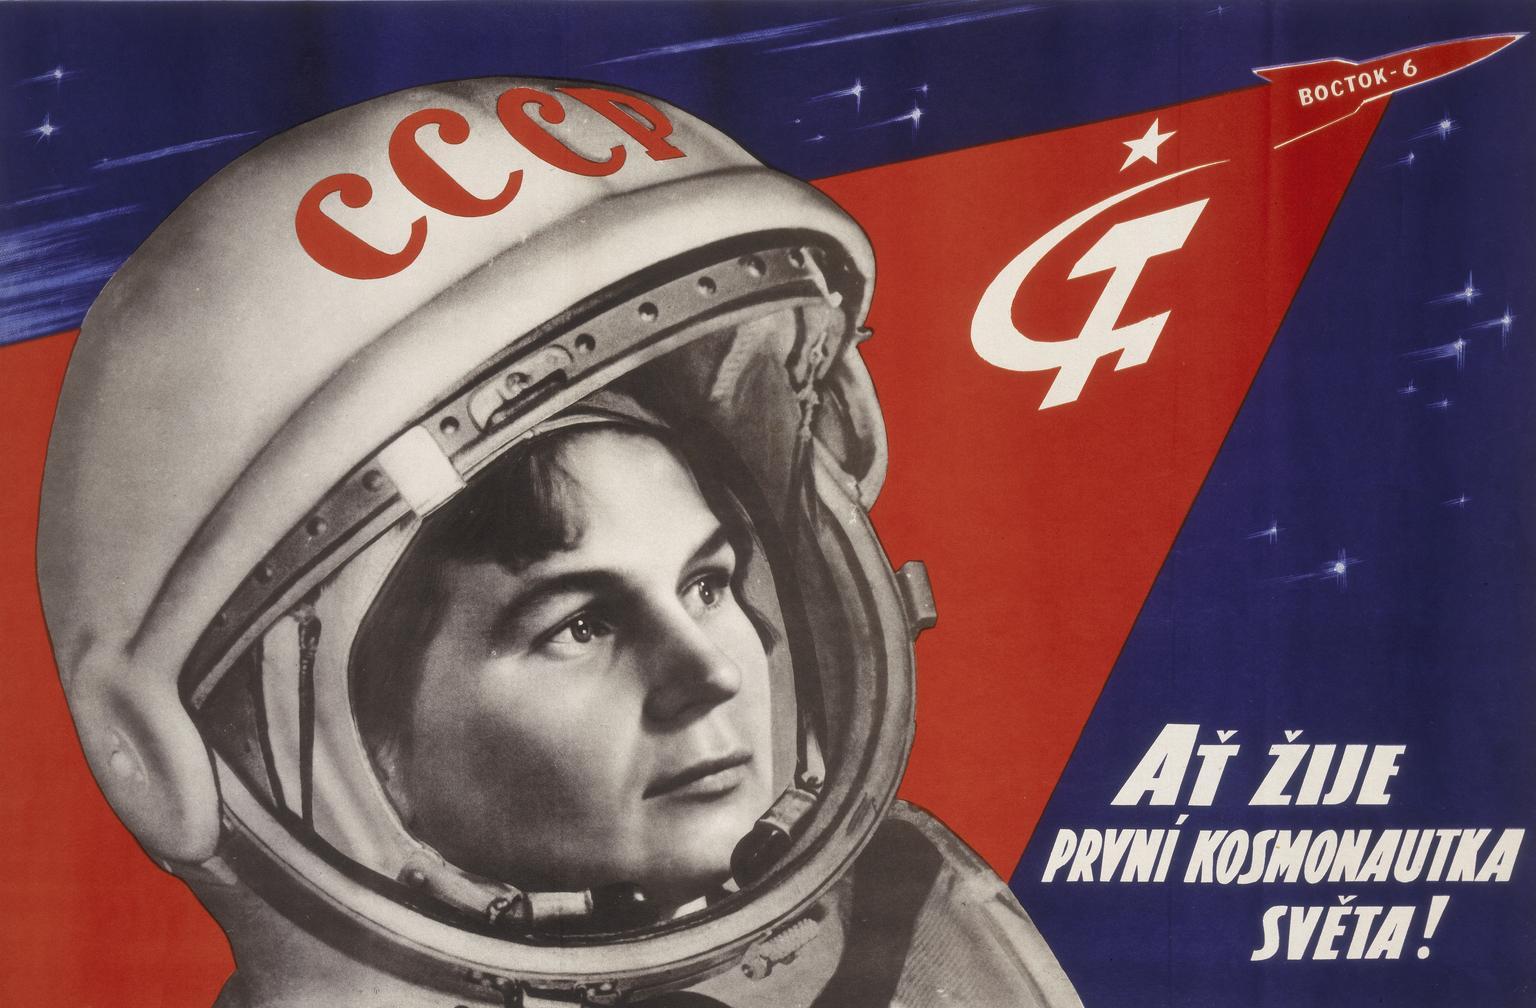 Famous Russian Women, Valentina Tereshkova © Soviet State Publishing House of Decorative/Fine Arts Moscow